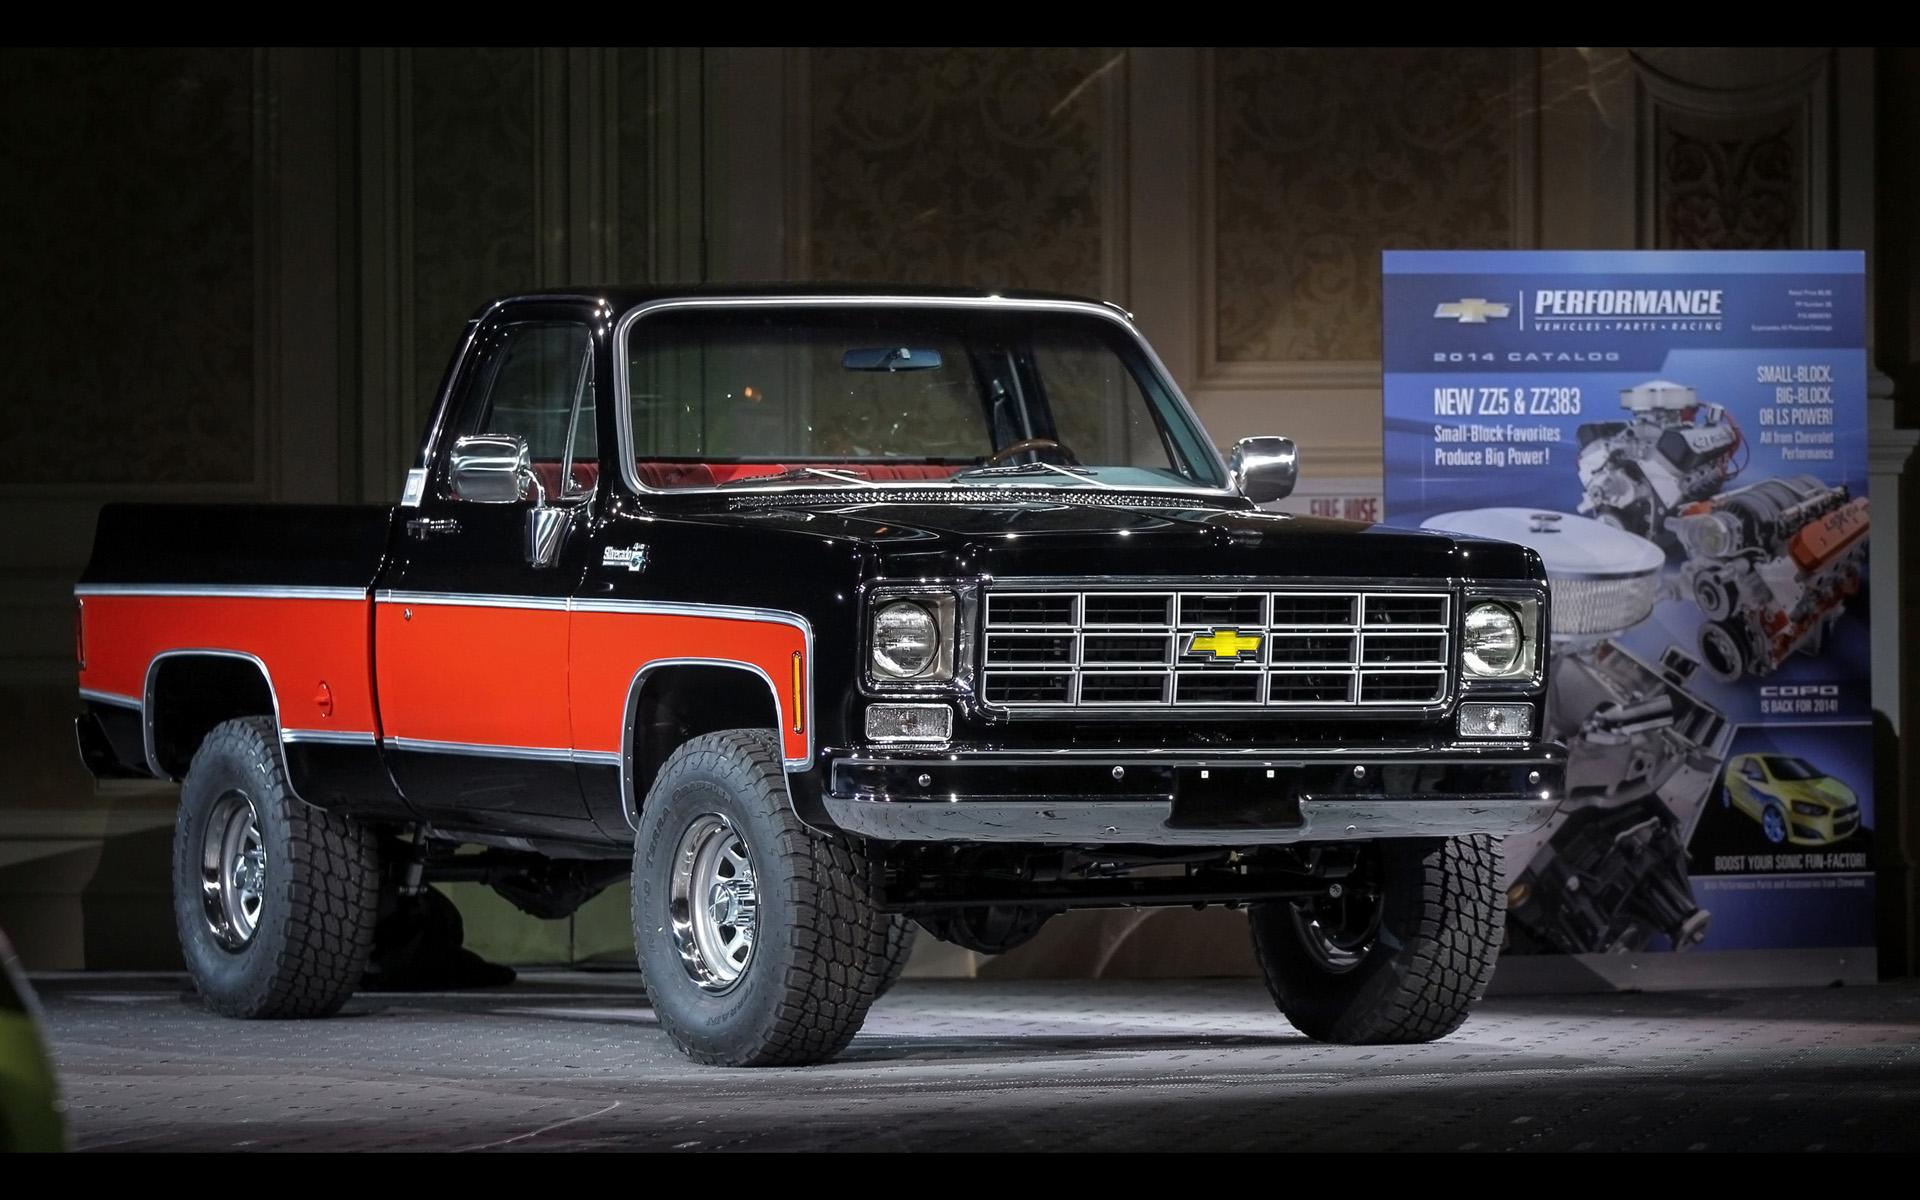 Truck Concepts at SEMA   1978 4x4 Pickup   3   1920x1200   Wallpaper 1920x1200